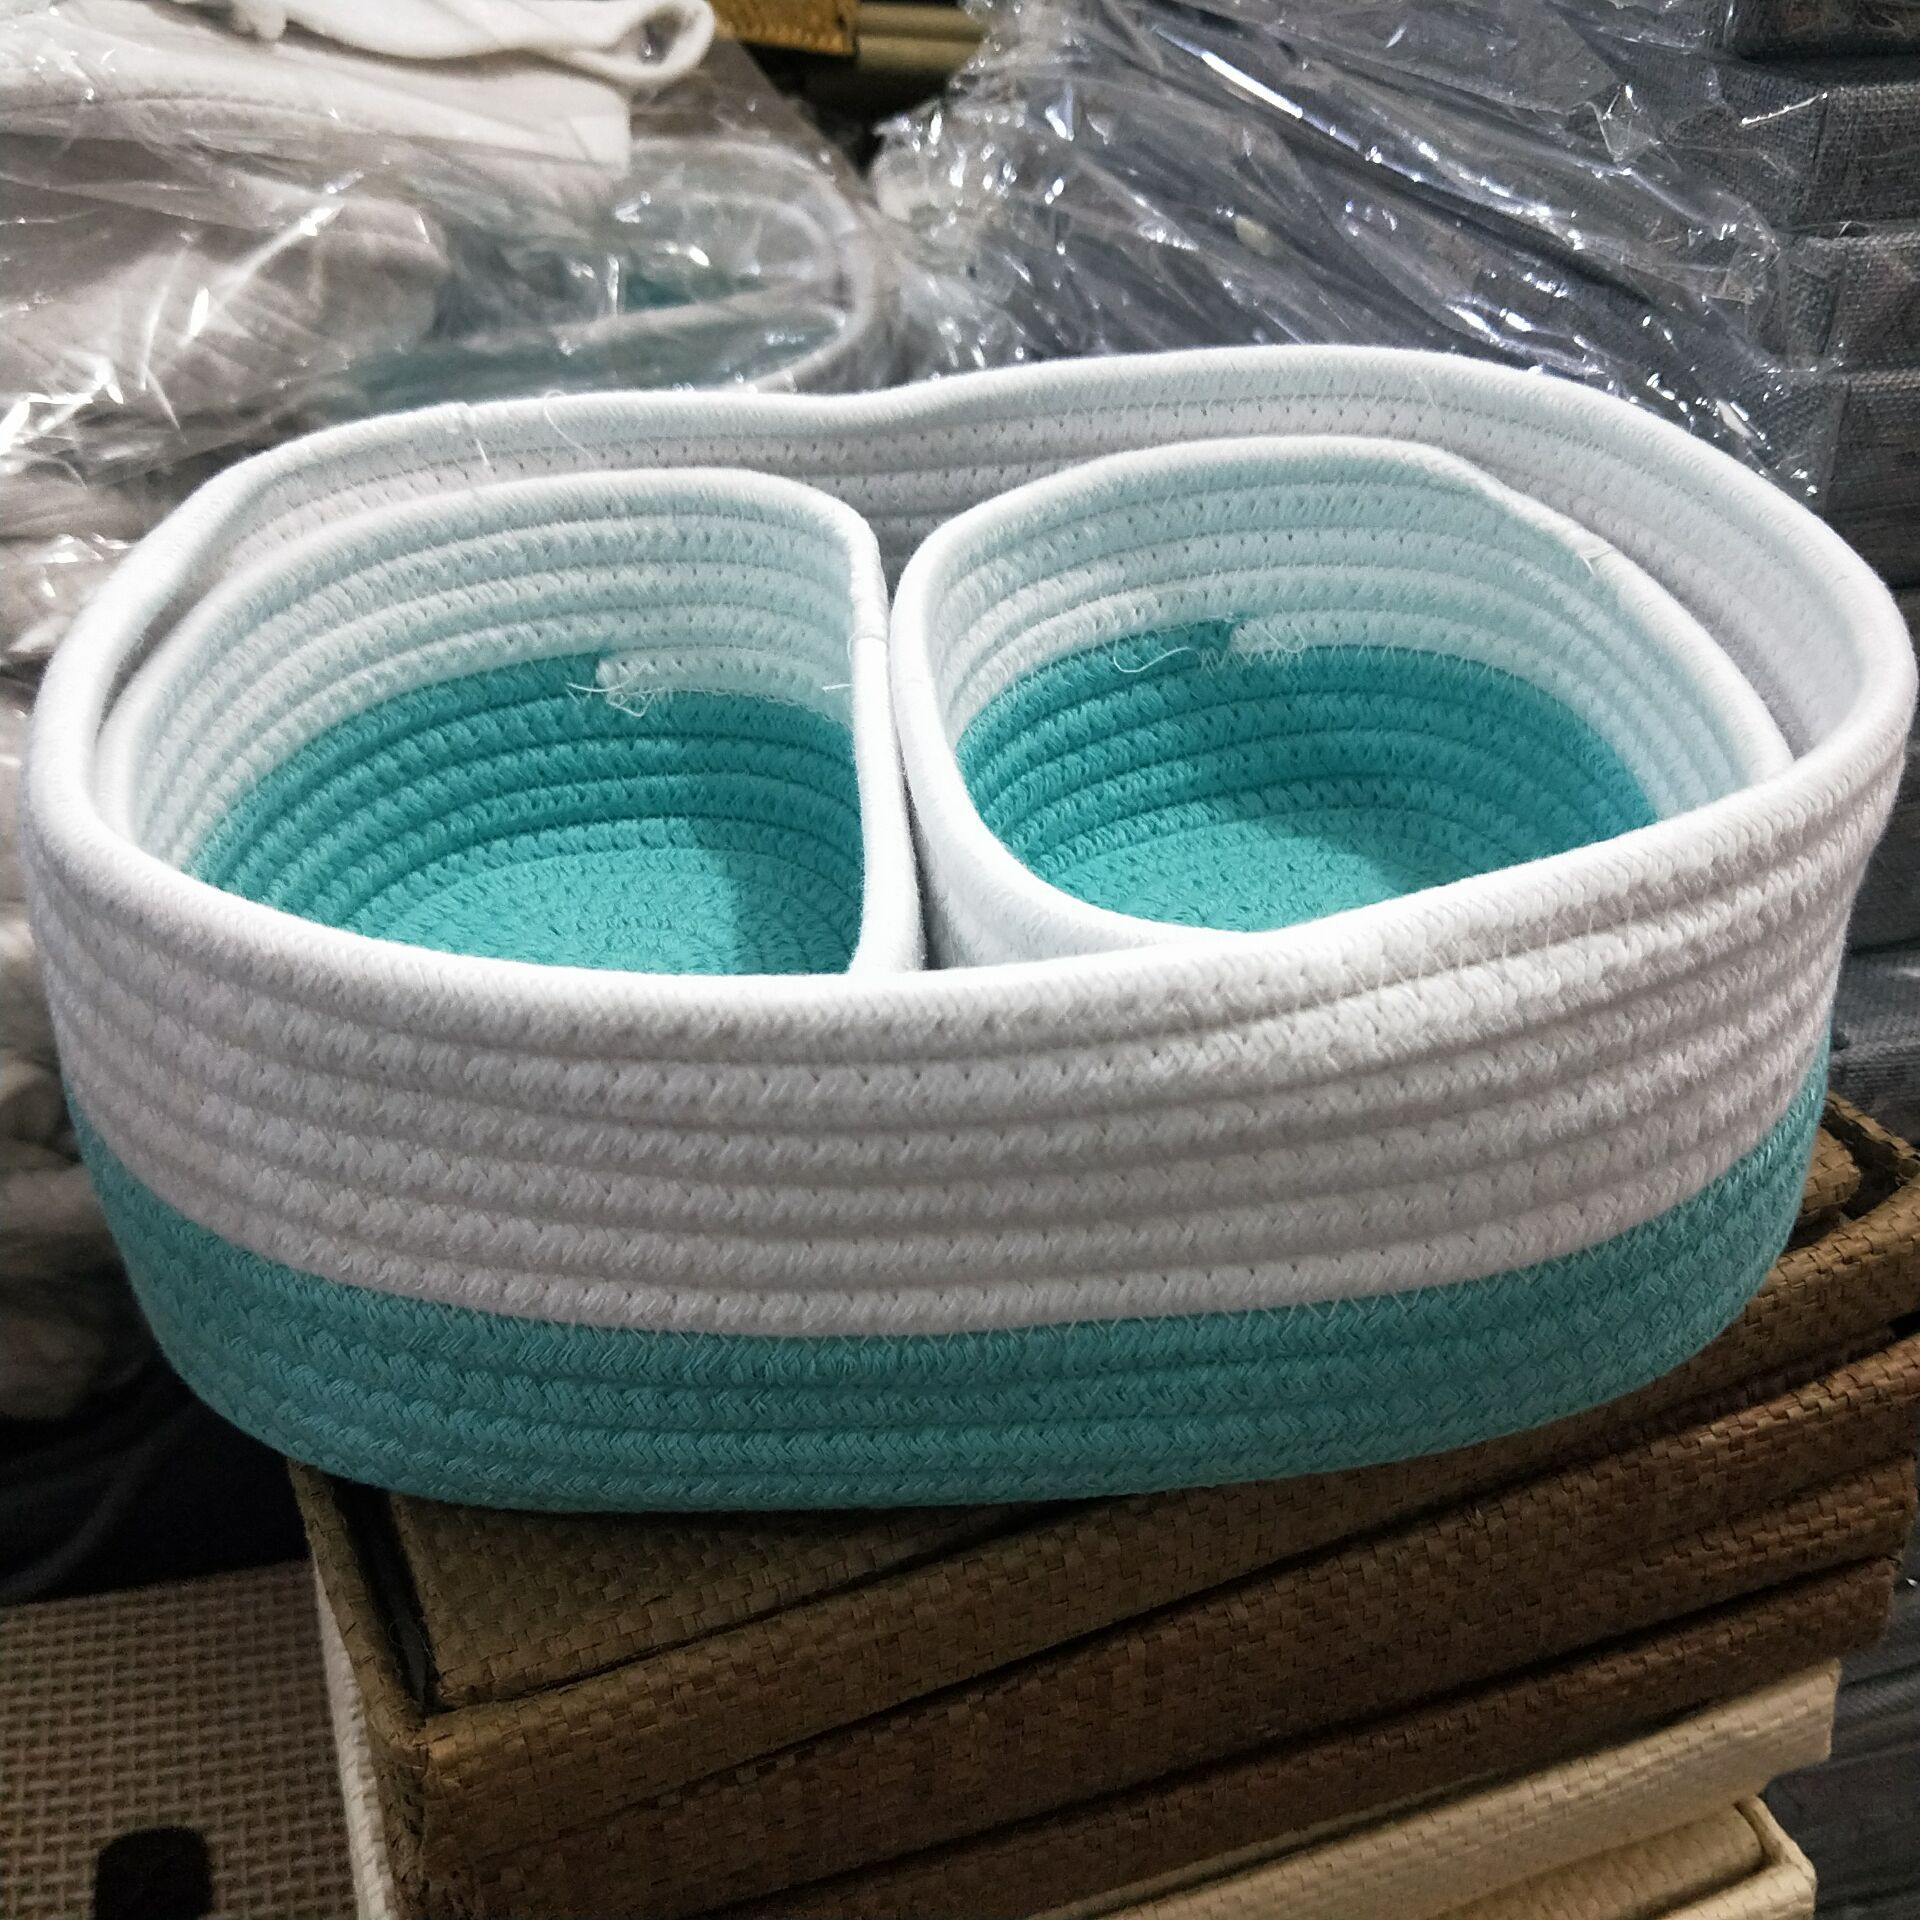 Storage-Basket Snacks Hand-Woven Cotton Desktop Home Debris